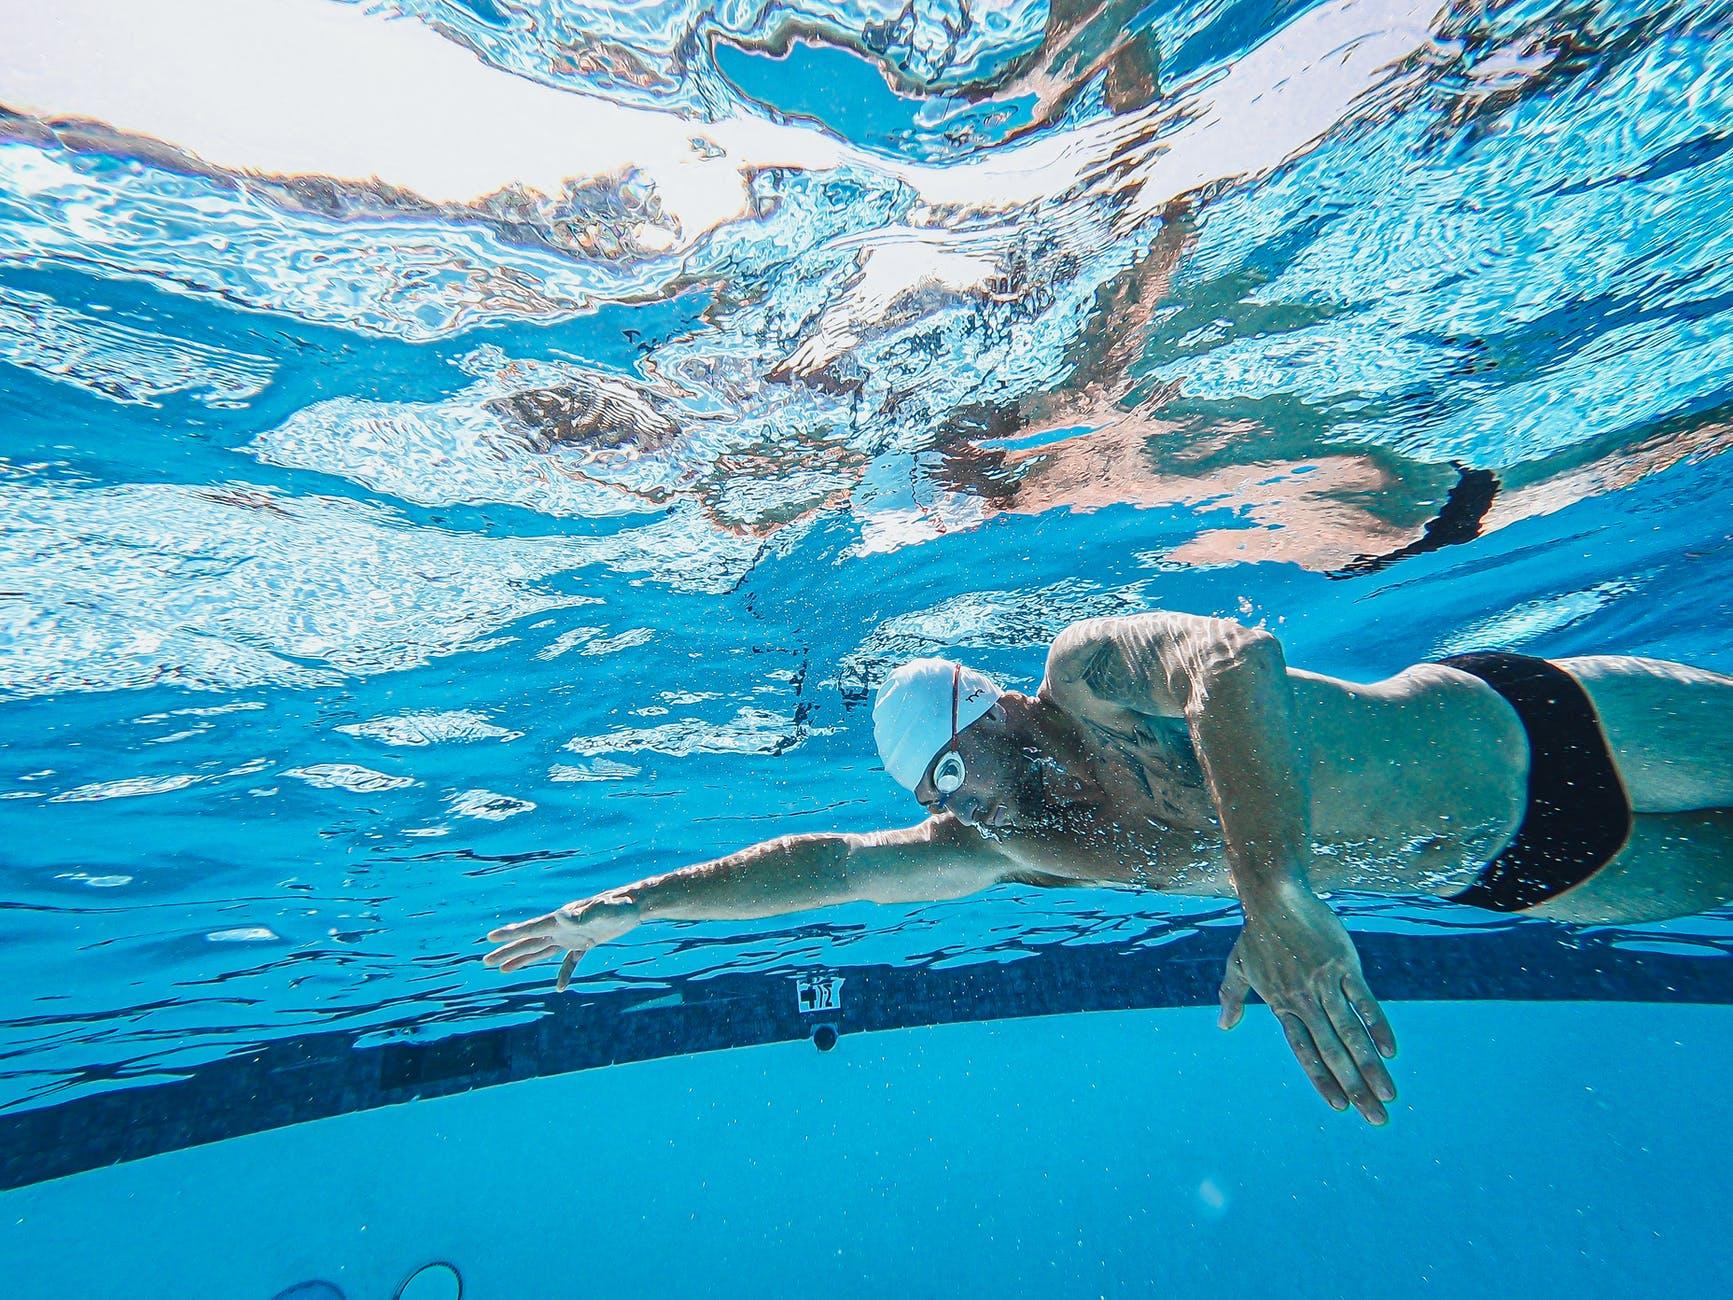 swimming, pool, pool workout, yescomusa